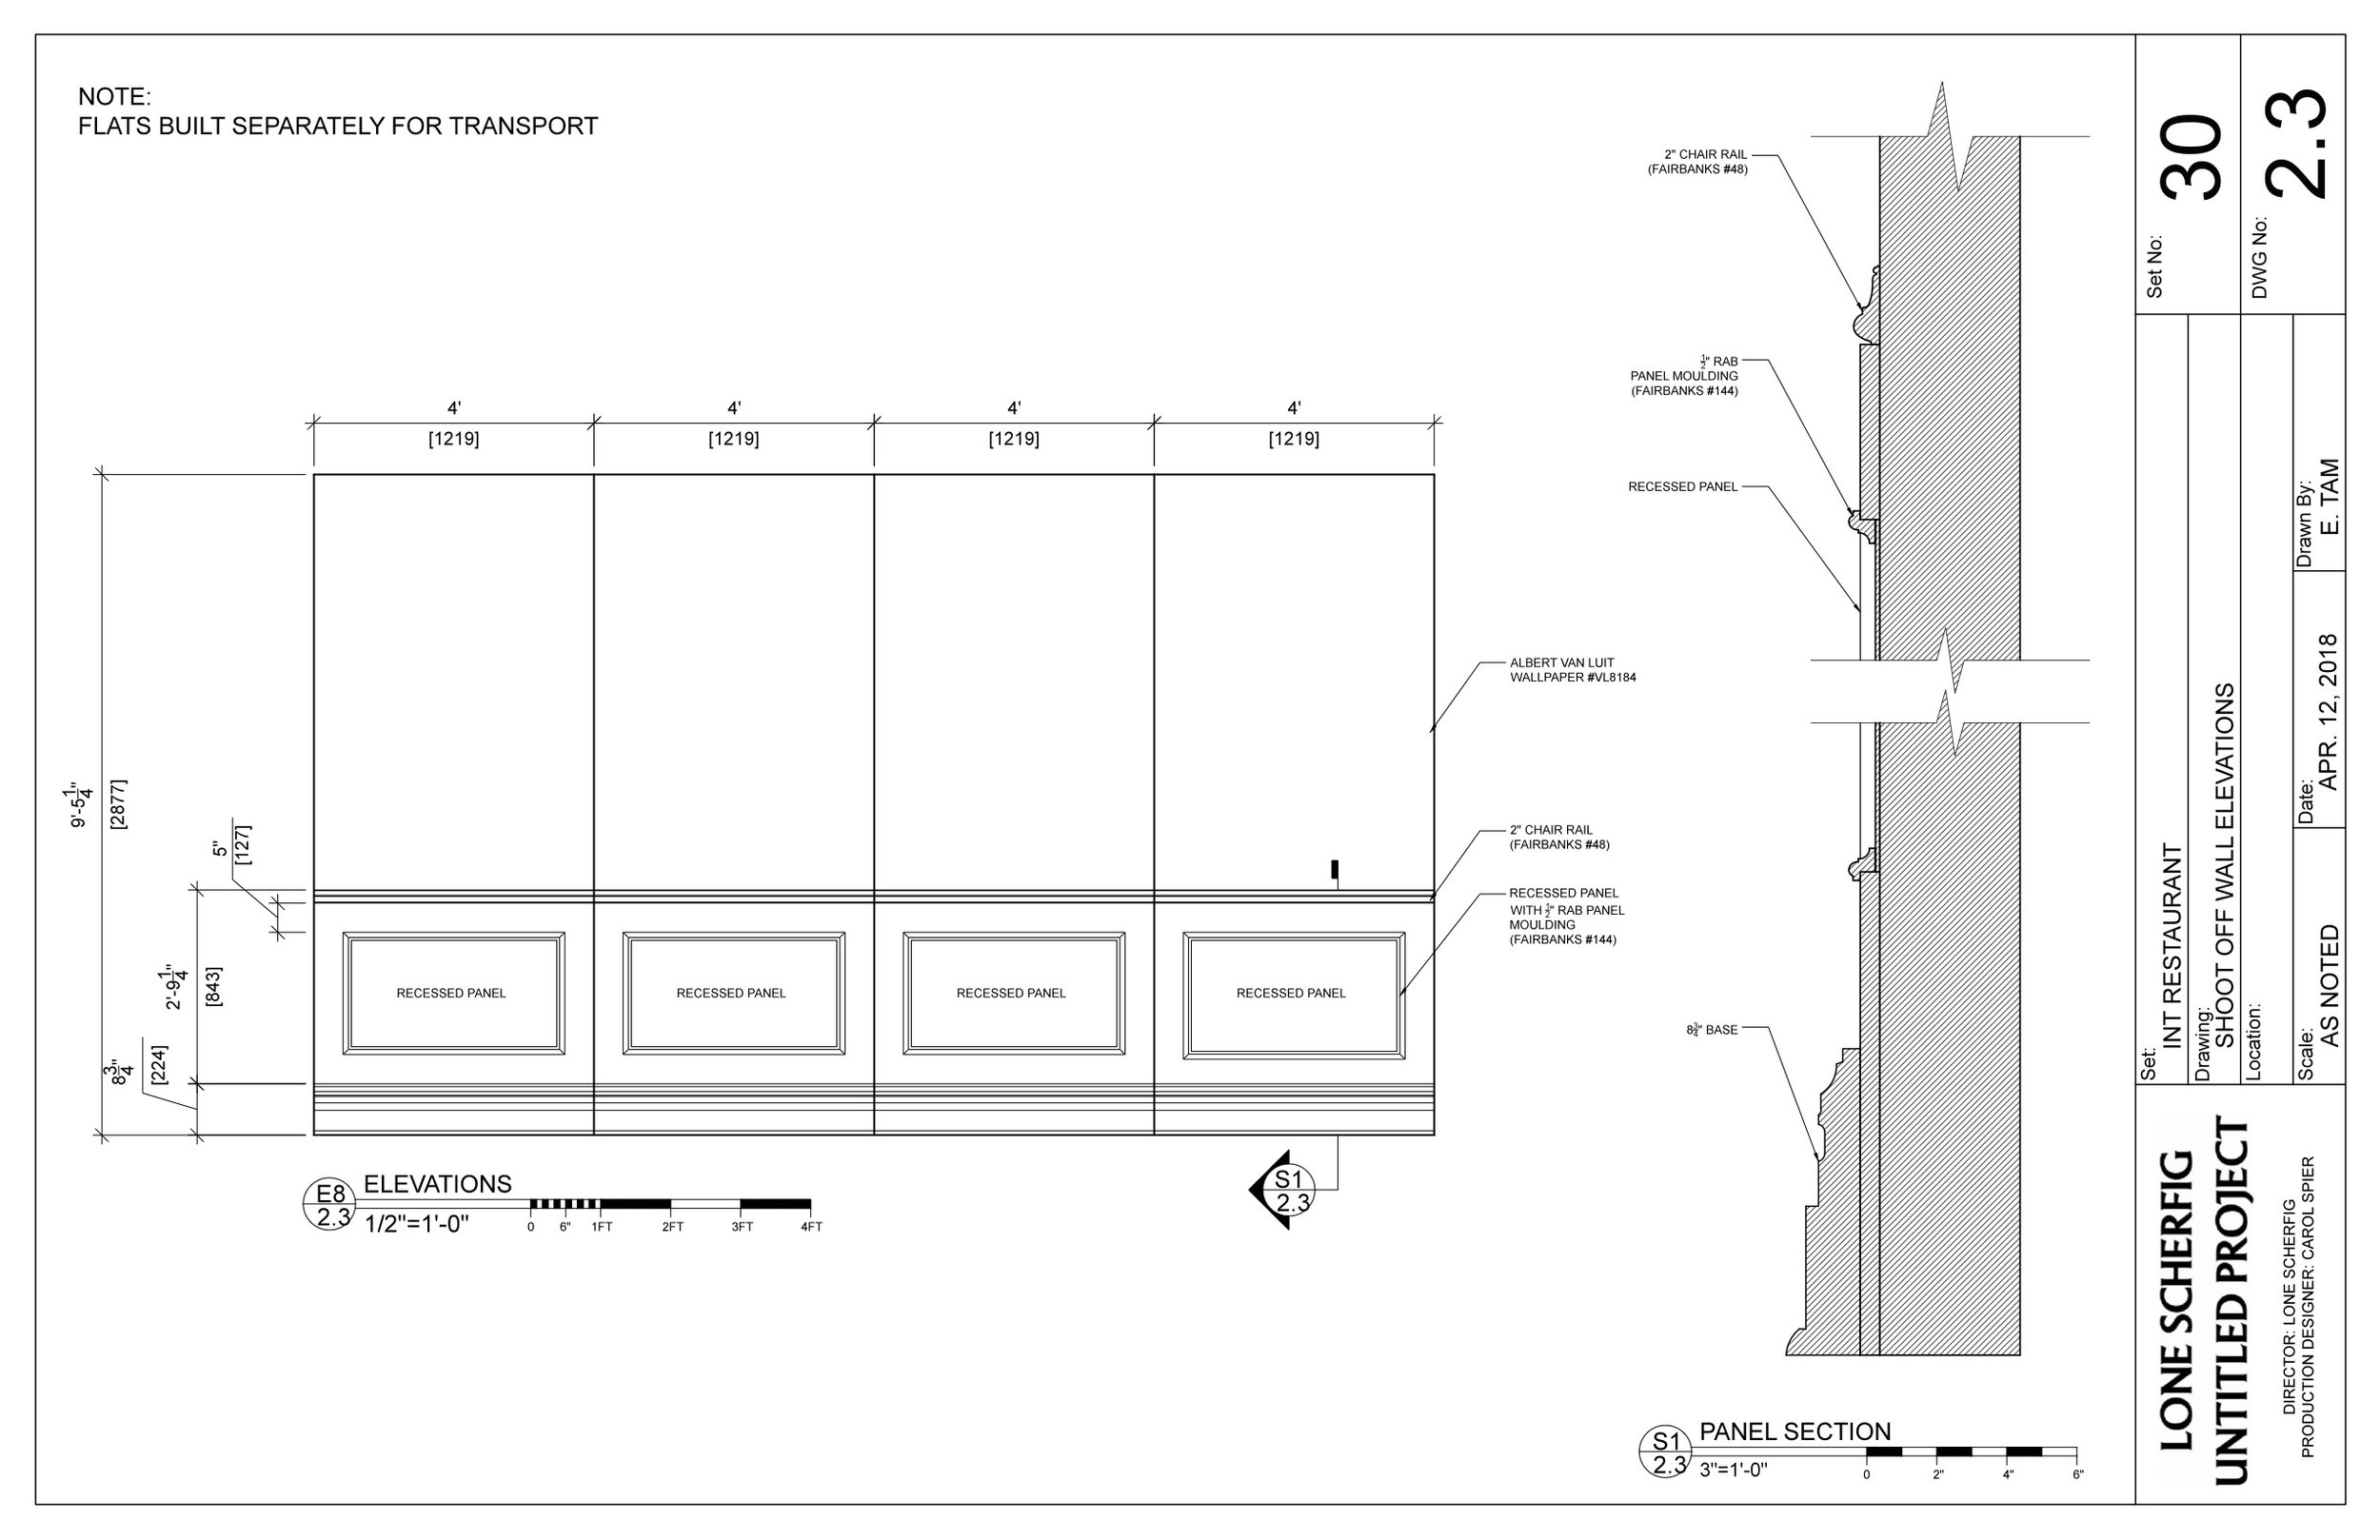 RTR_30-2.3_INT RESTAURANT_ELEVATIONS_180412.jpg